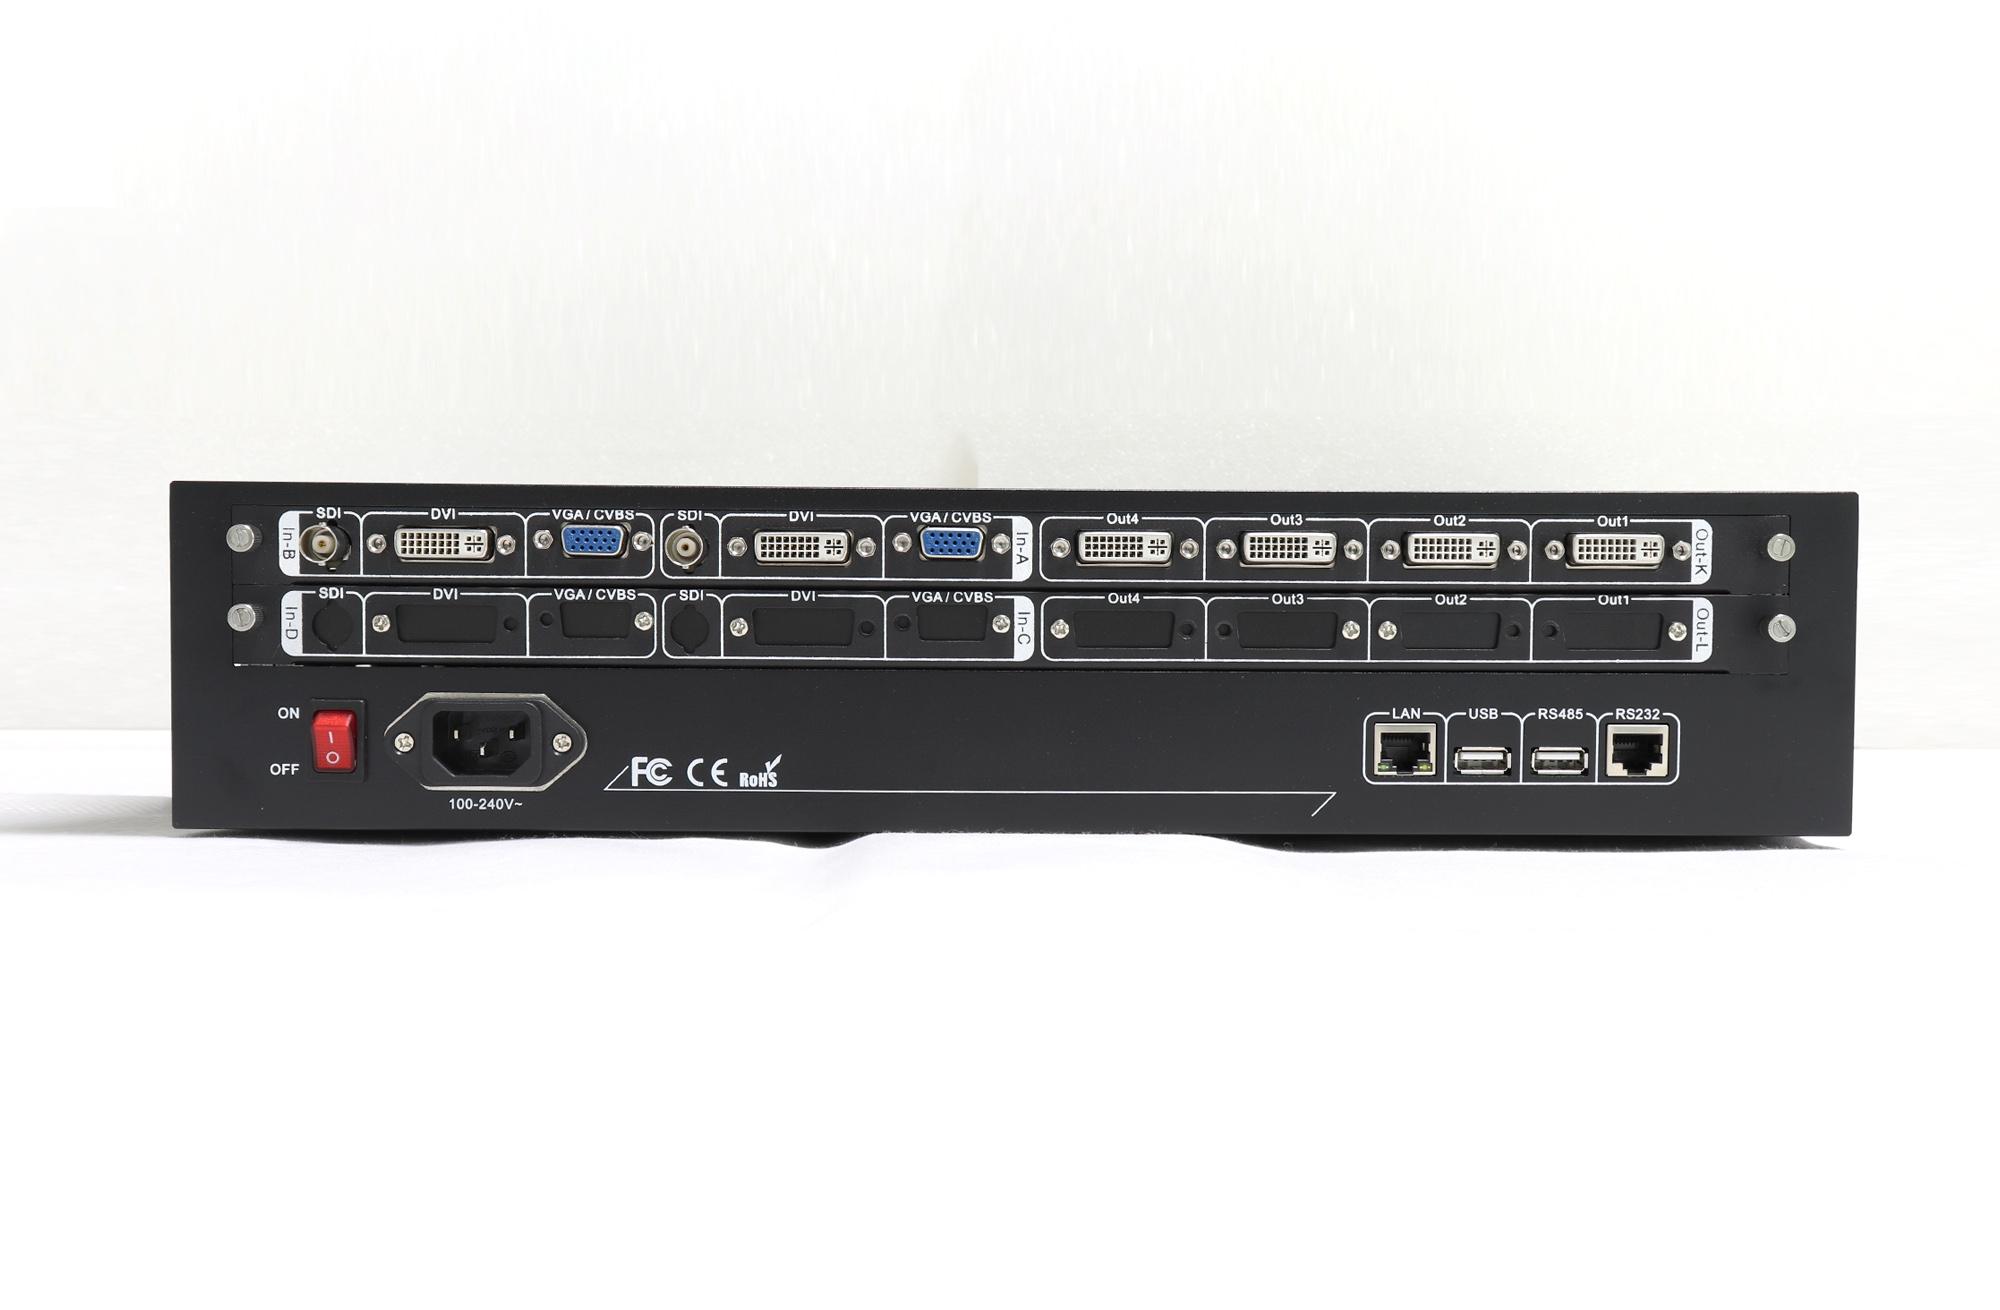 VDWALL LVP7000 Multi-window LED video wall processor